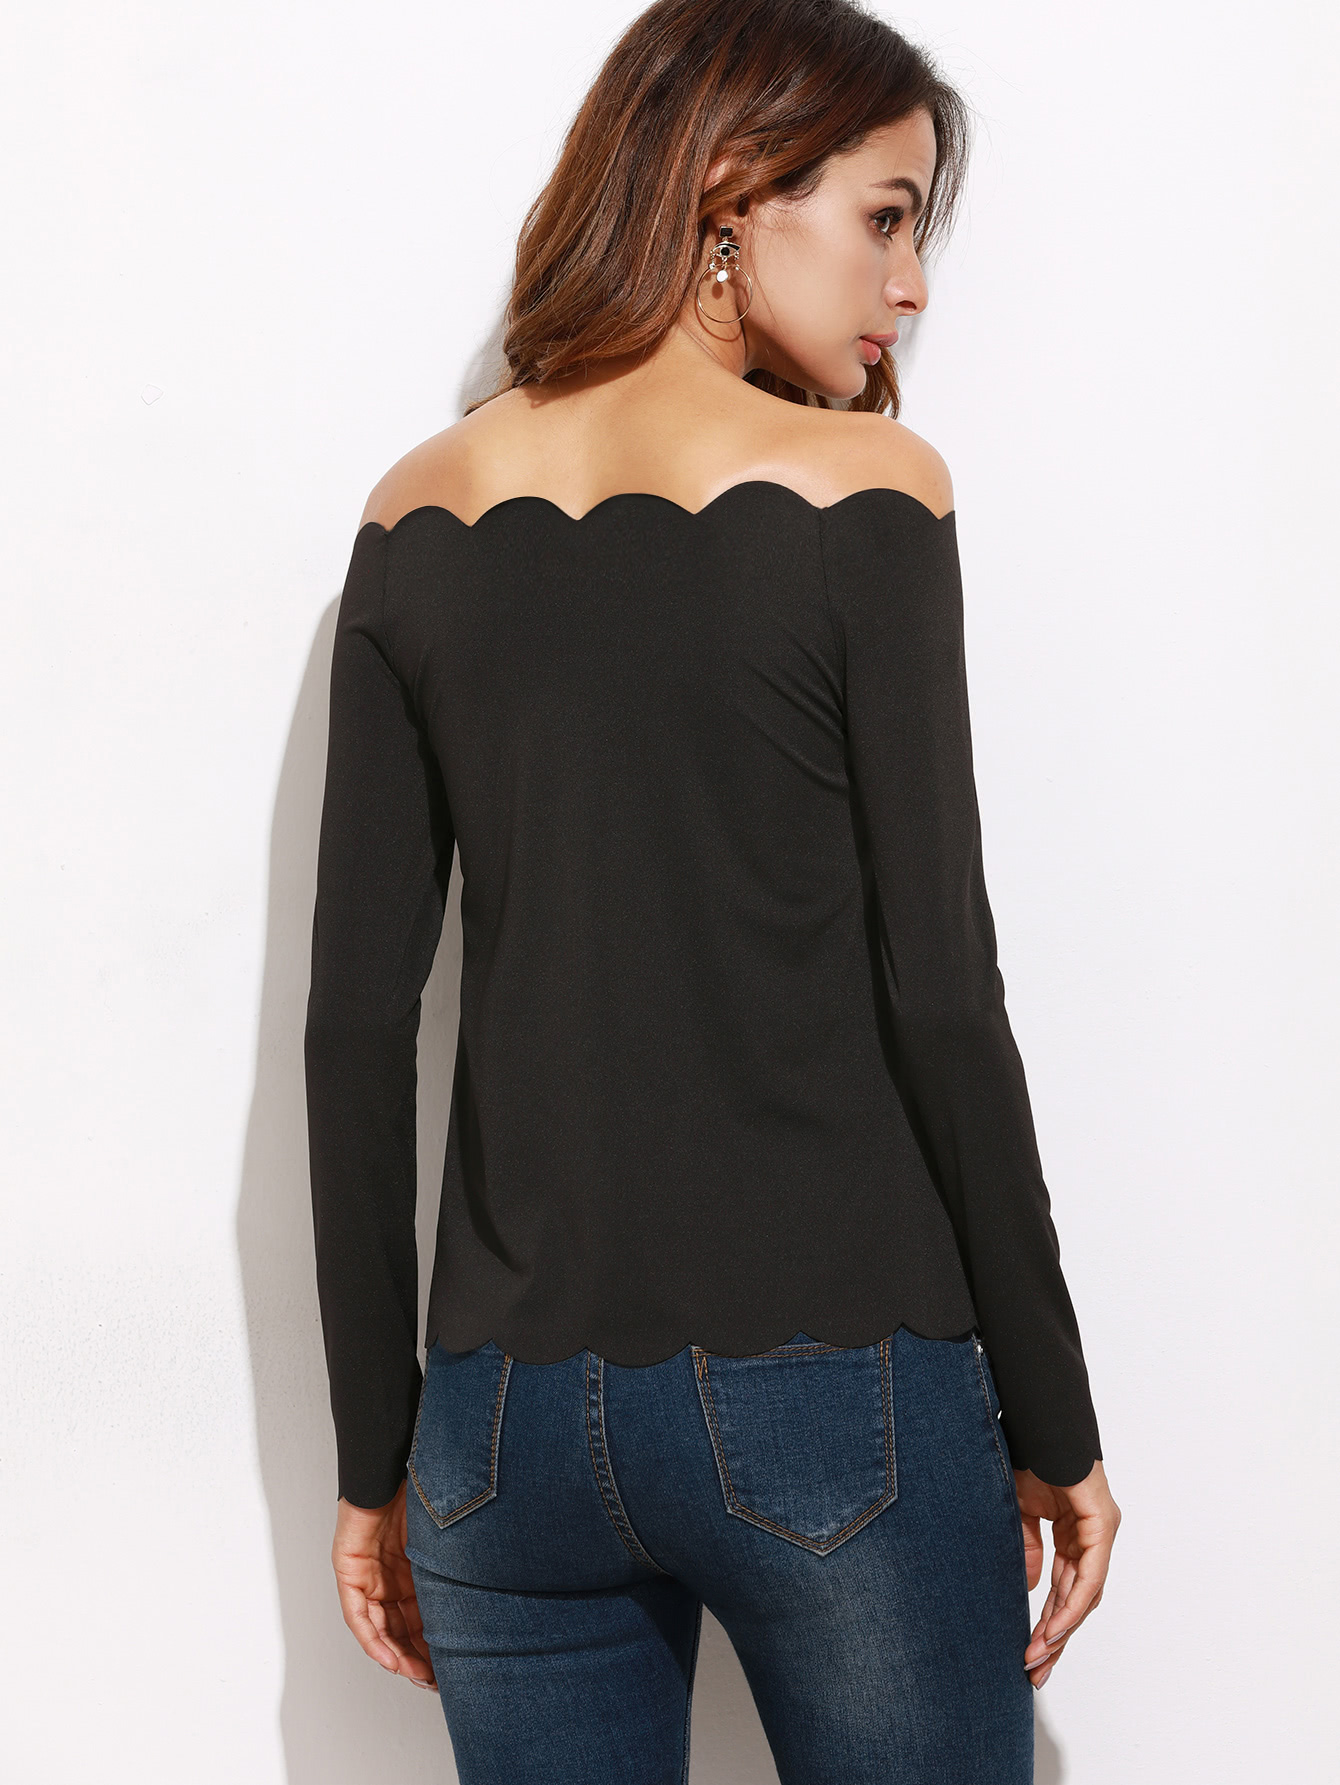 blouse161003704_2